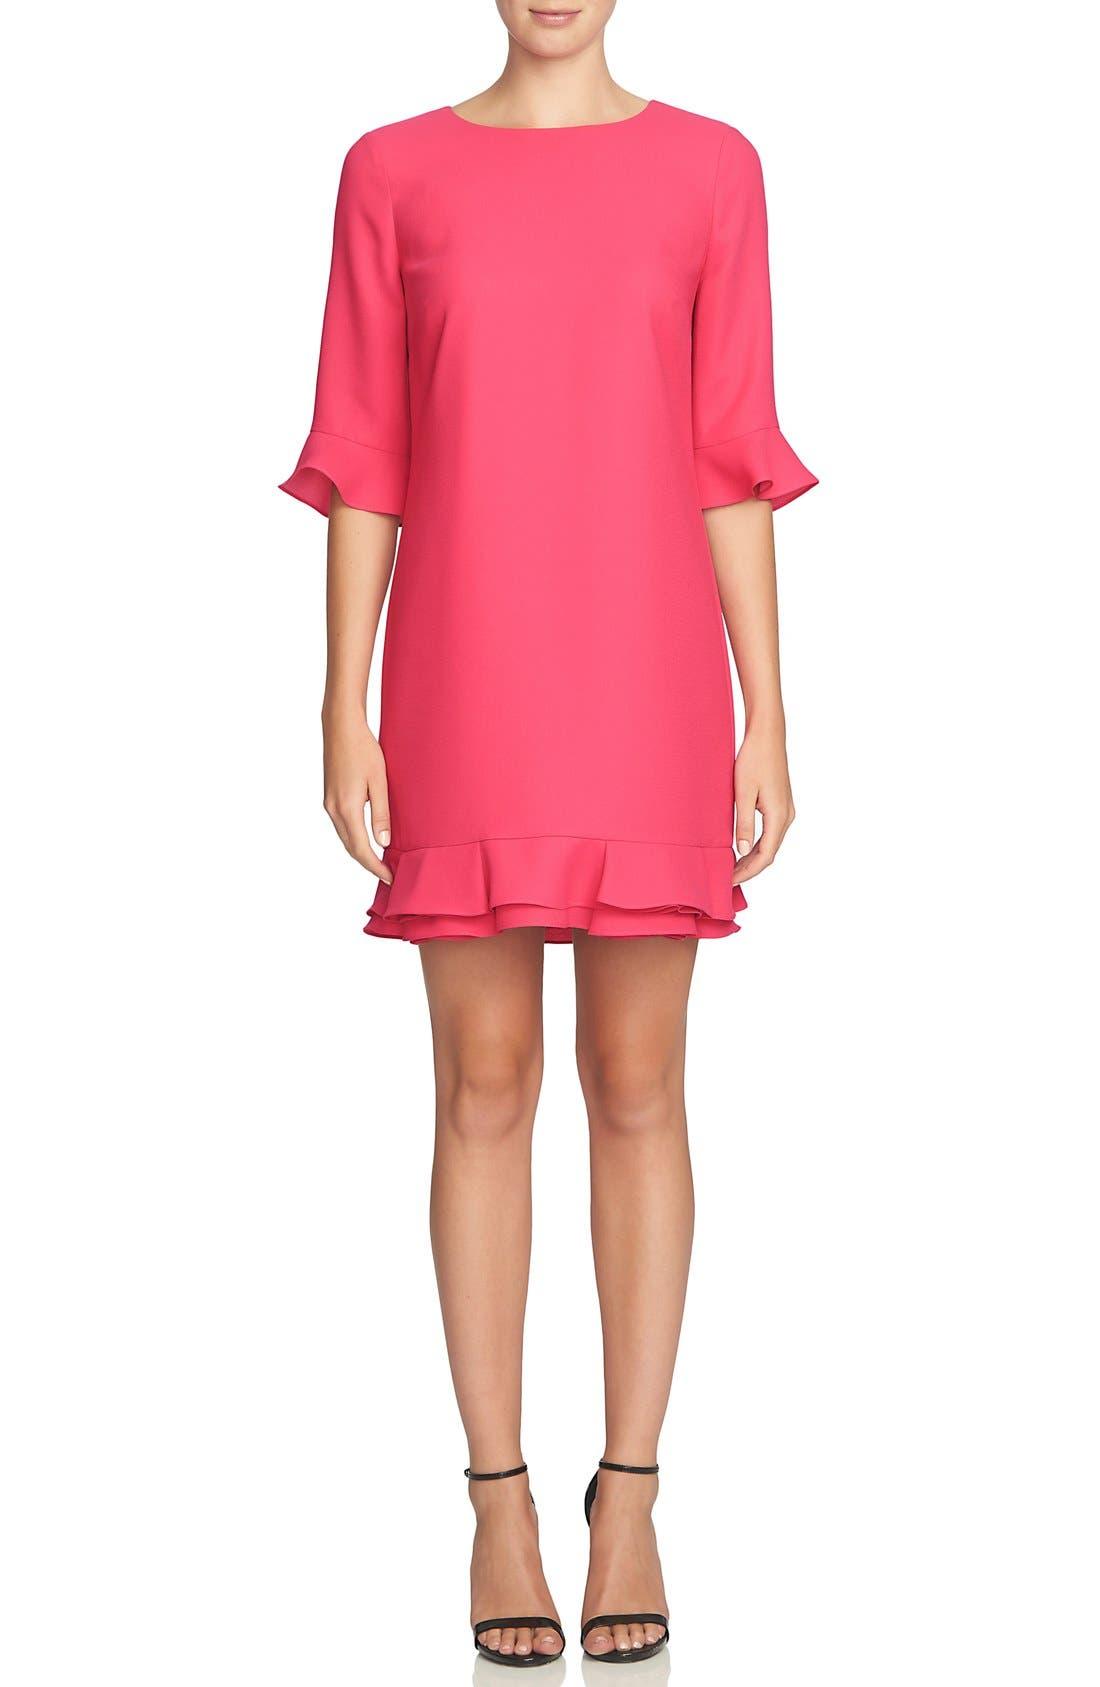 Alternate Image 1 Selected - CeCe 'Kate' Ruffle Hem Shift Dress (Regular & Petite)